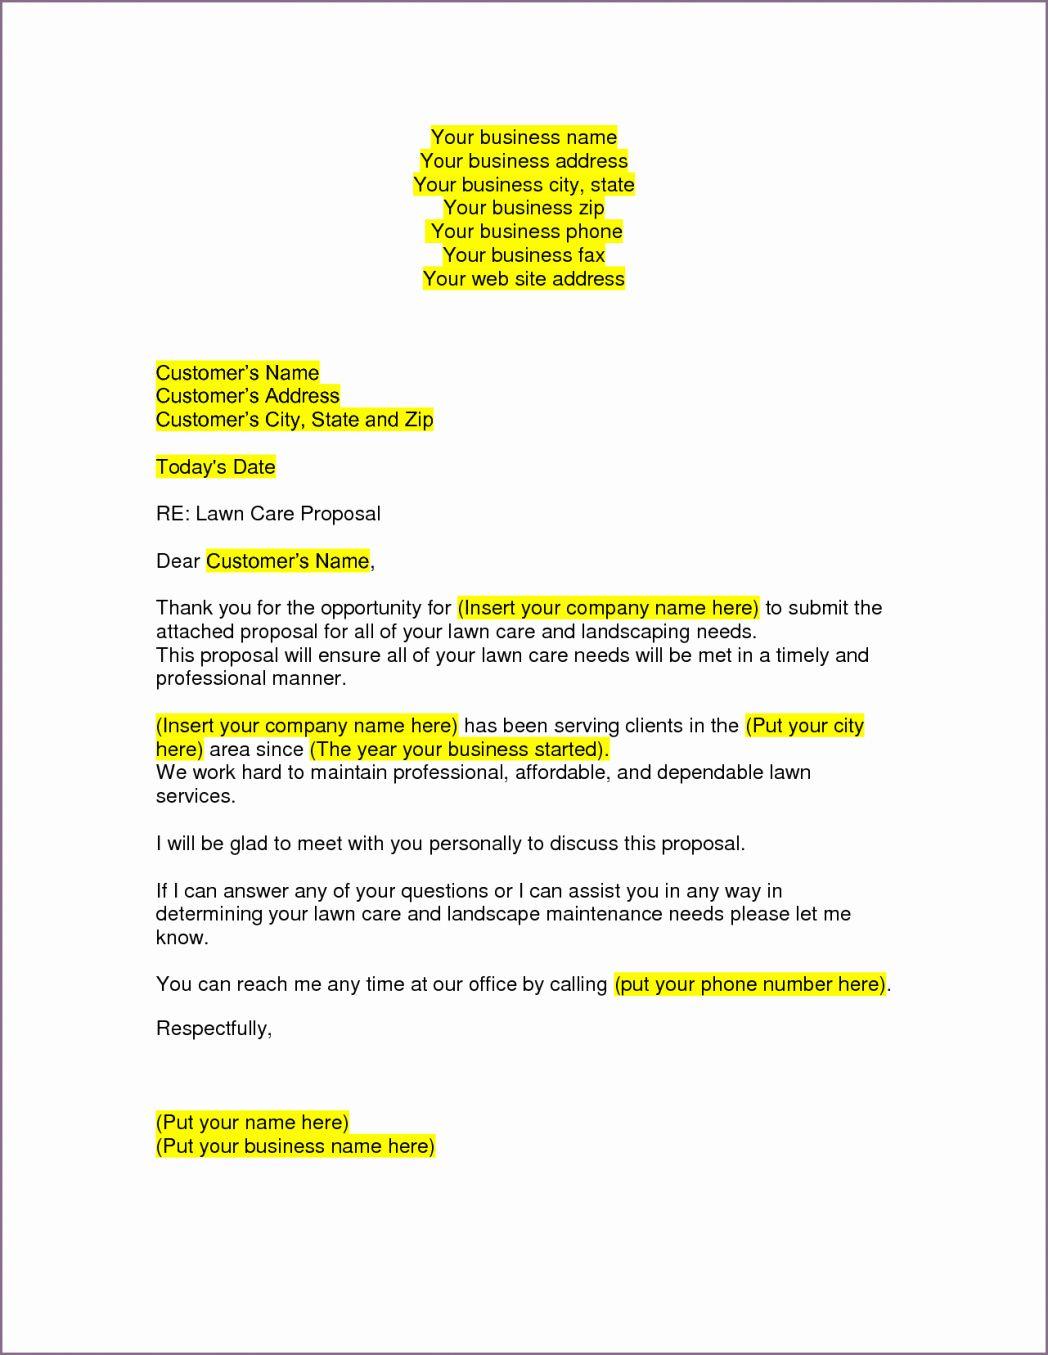 Landscaping Bid Proposal Template Luxury Lawn Care Proposal Proposal Letter Business Proposal Letter Business Plan Template